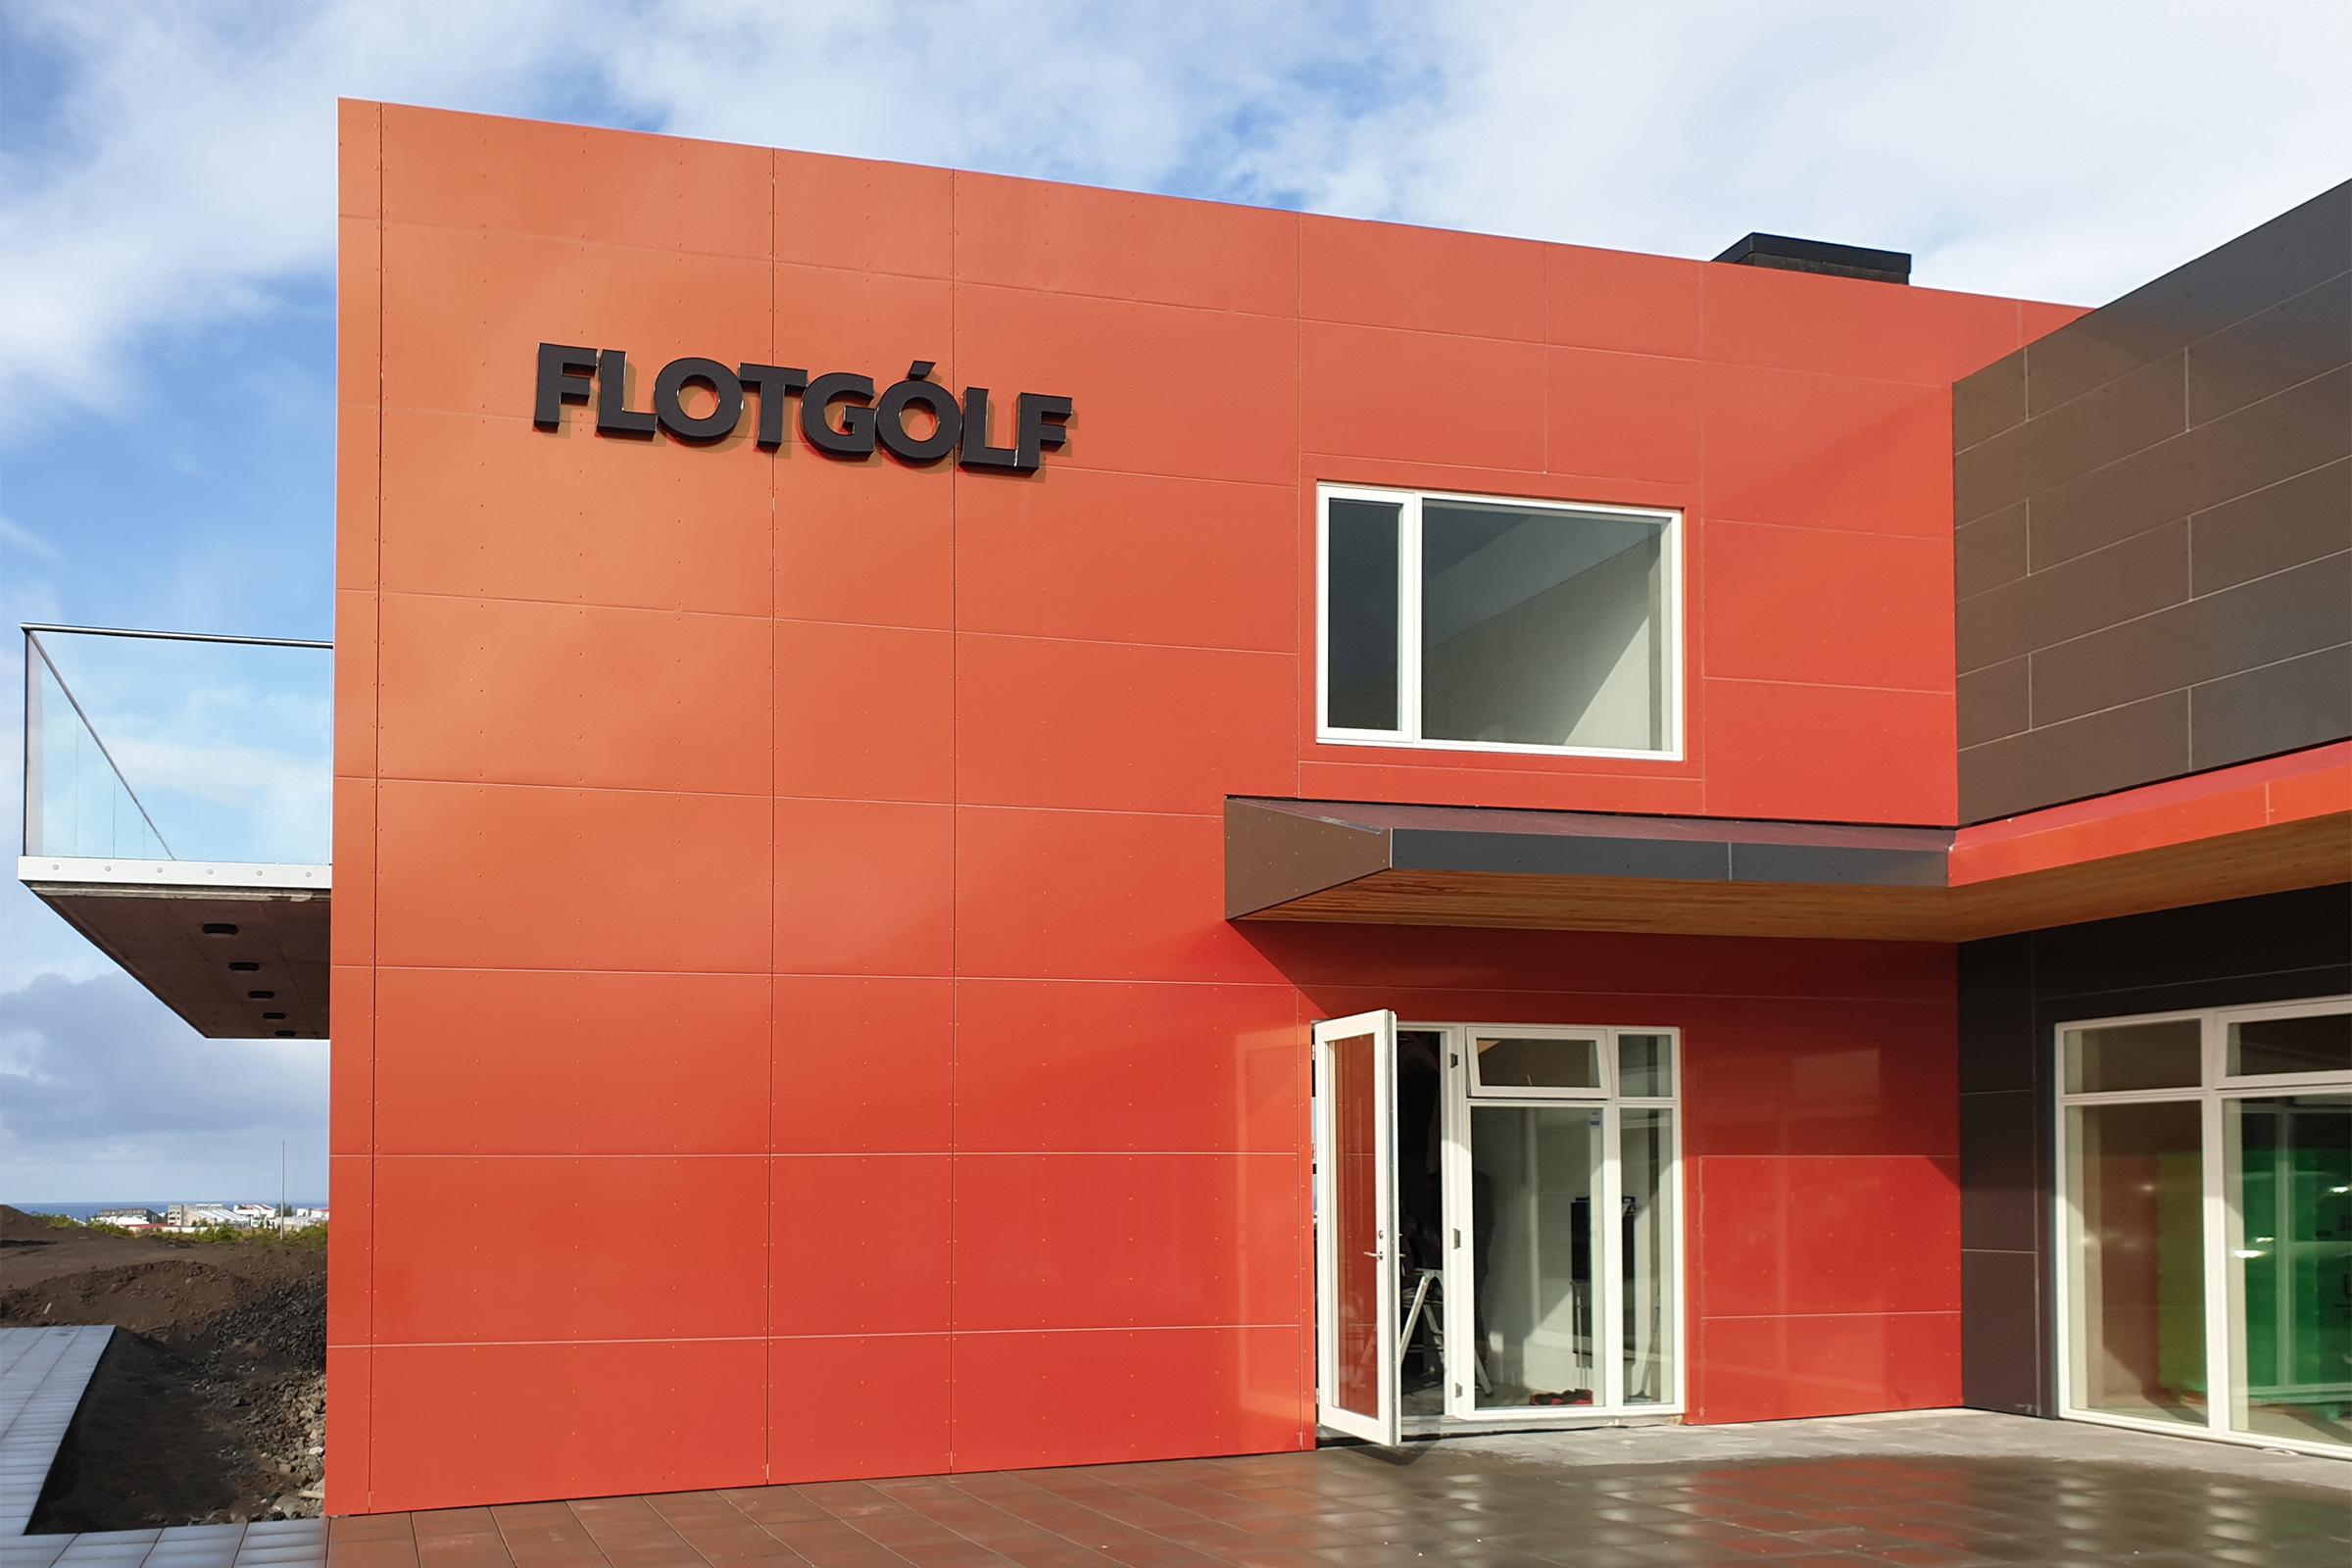 flotgolf-sede-central-detalle-1-STB-S08